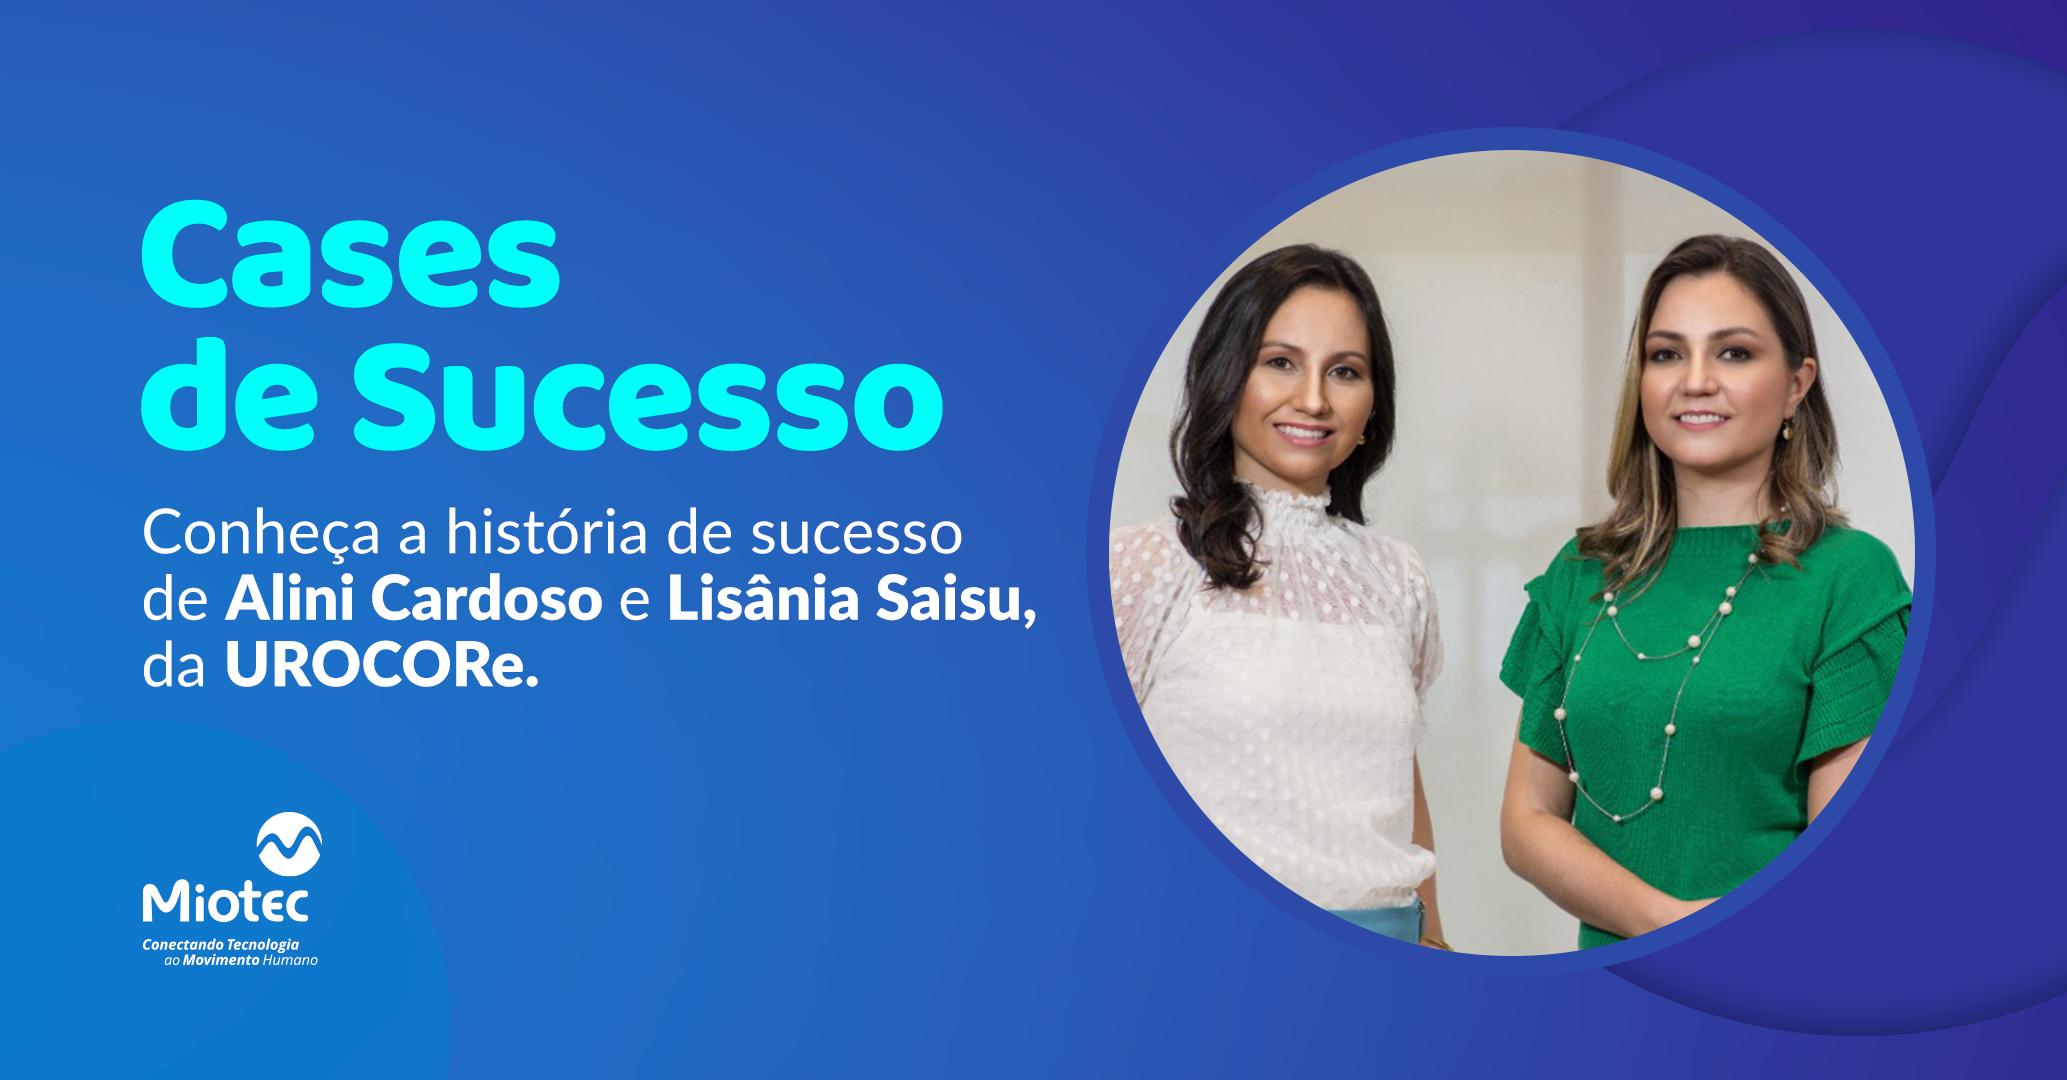 UROCORe: Pioneirismo, tecnologia e coragem para quebrar tabus e promover a saúde